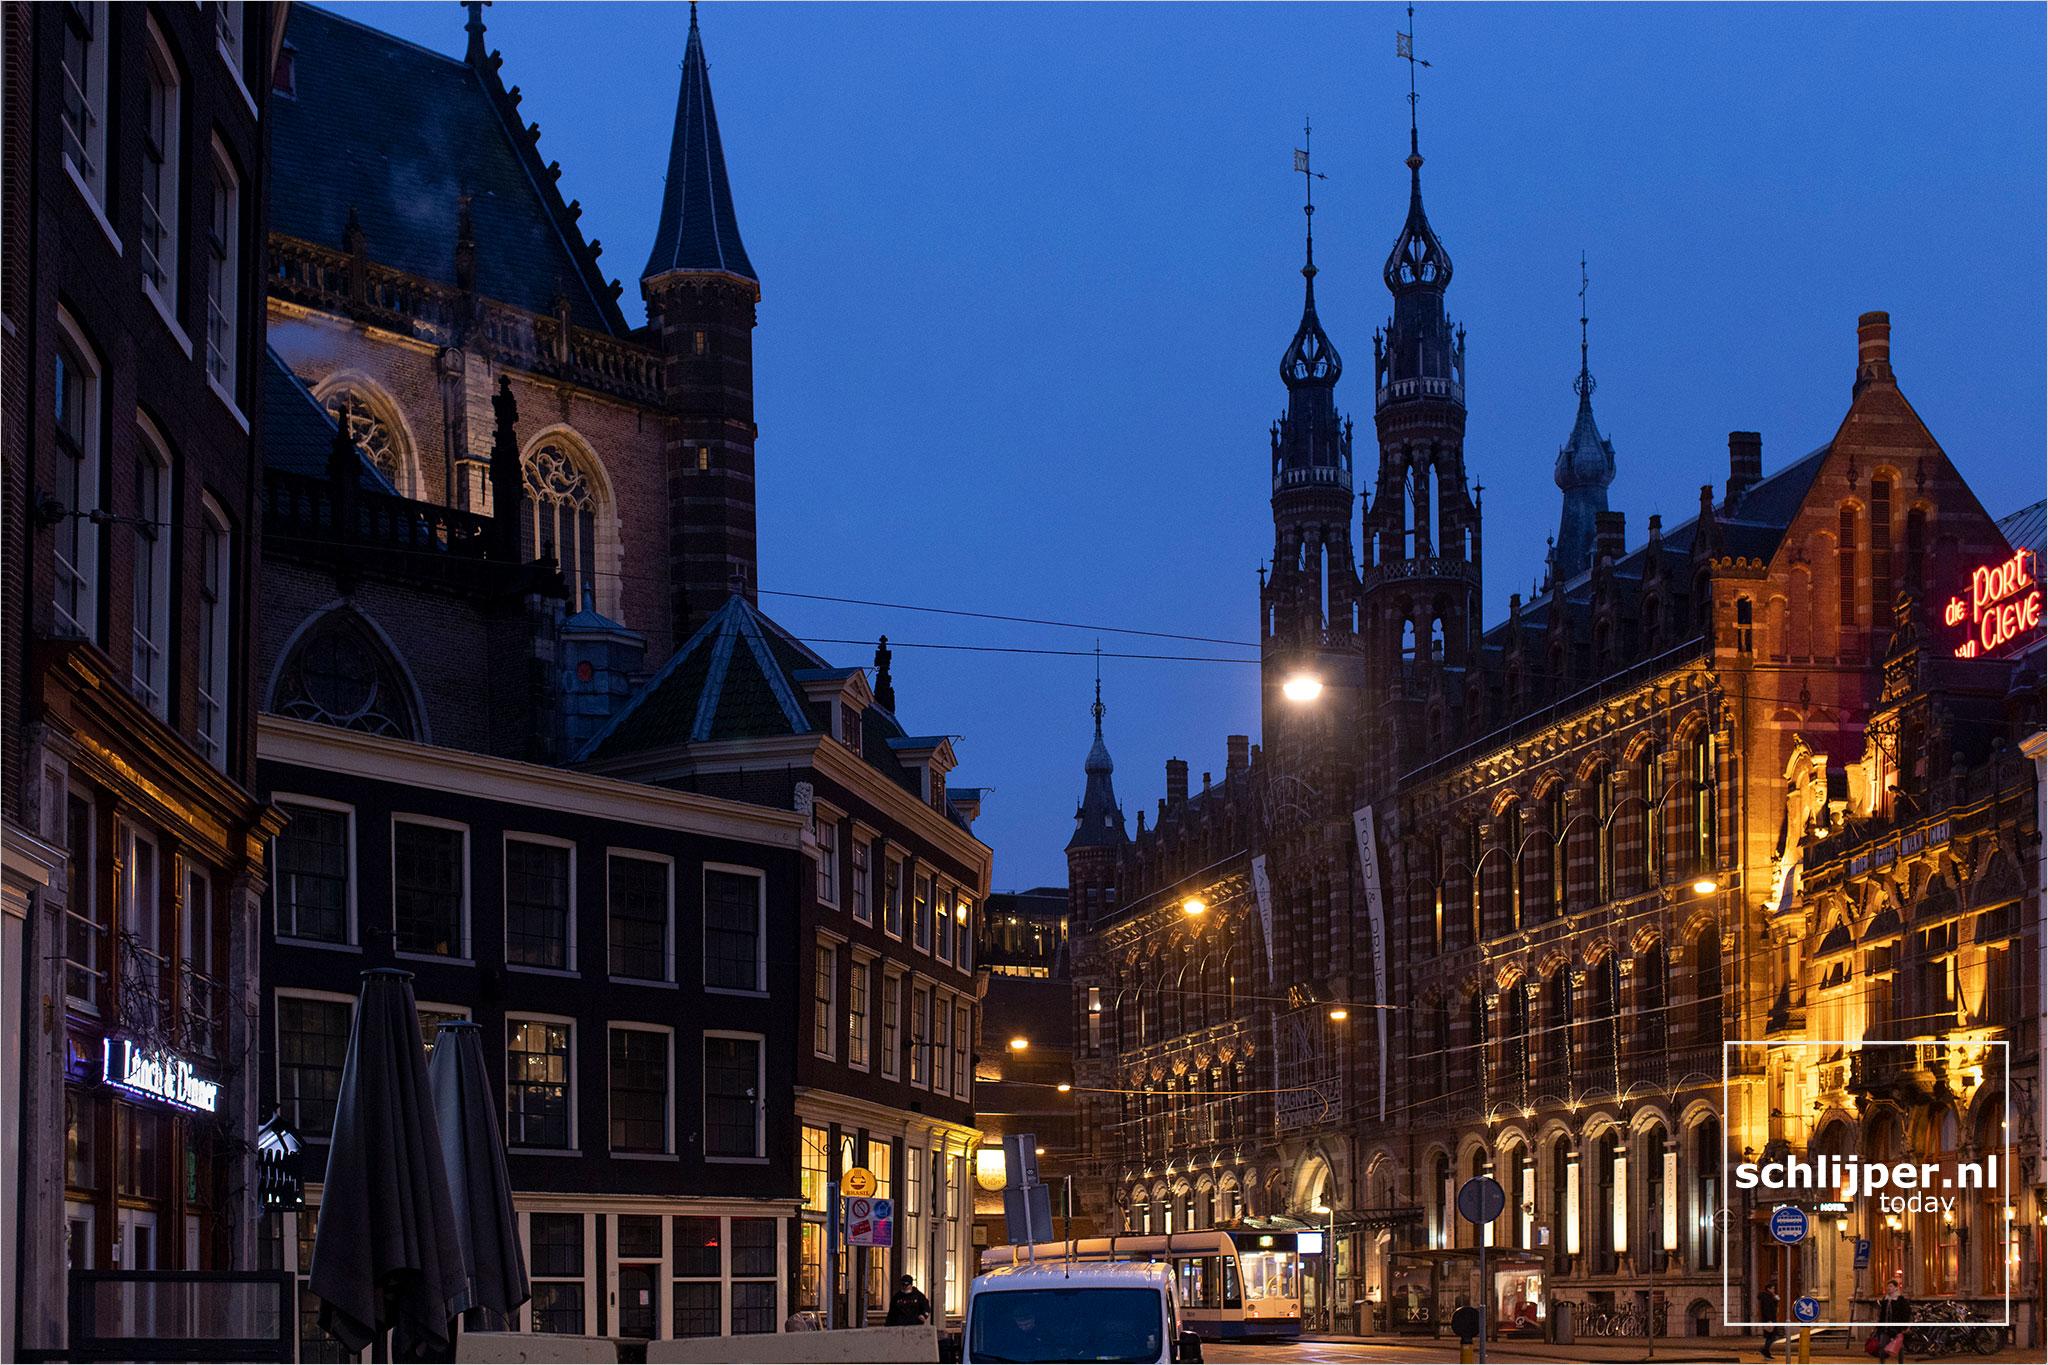 The Netherlands, Amsterdam, 27 januari 2021